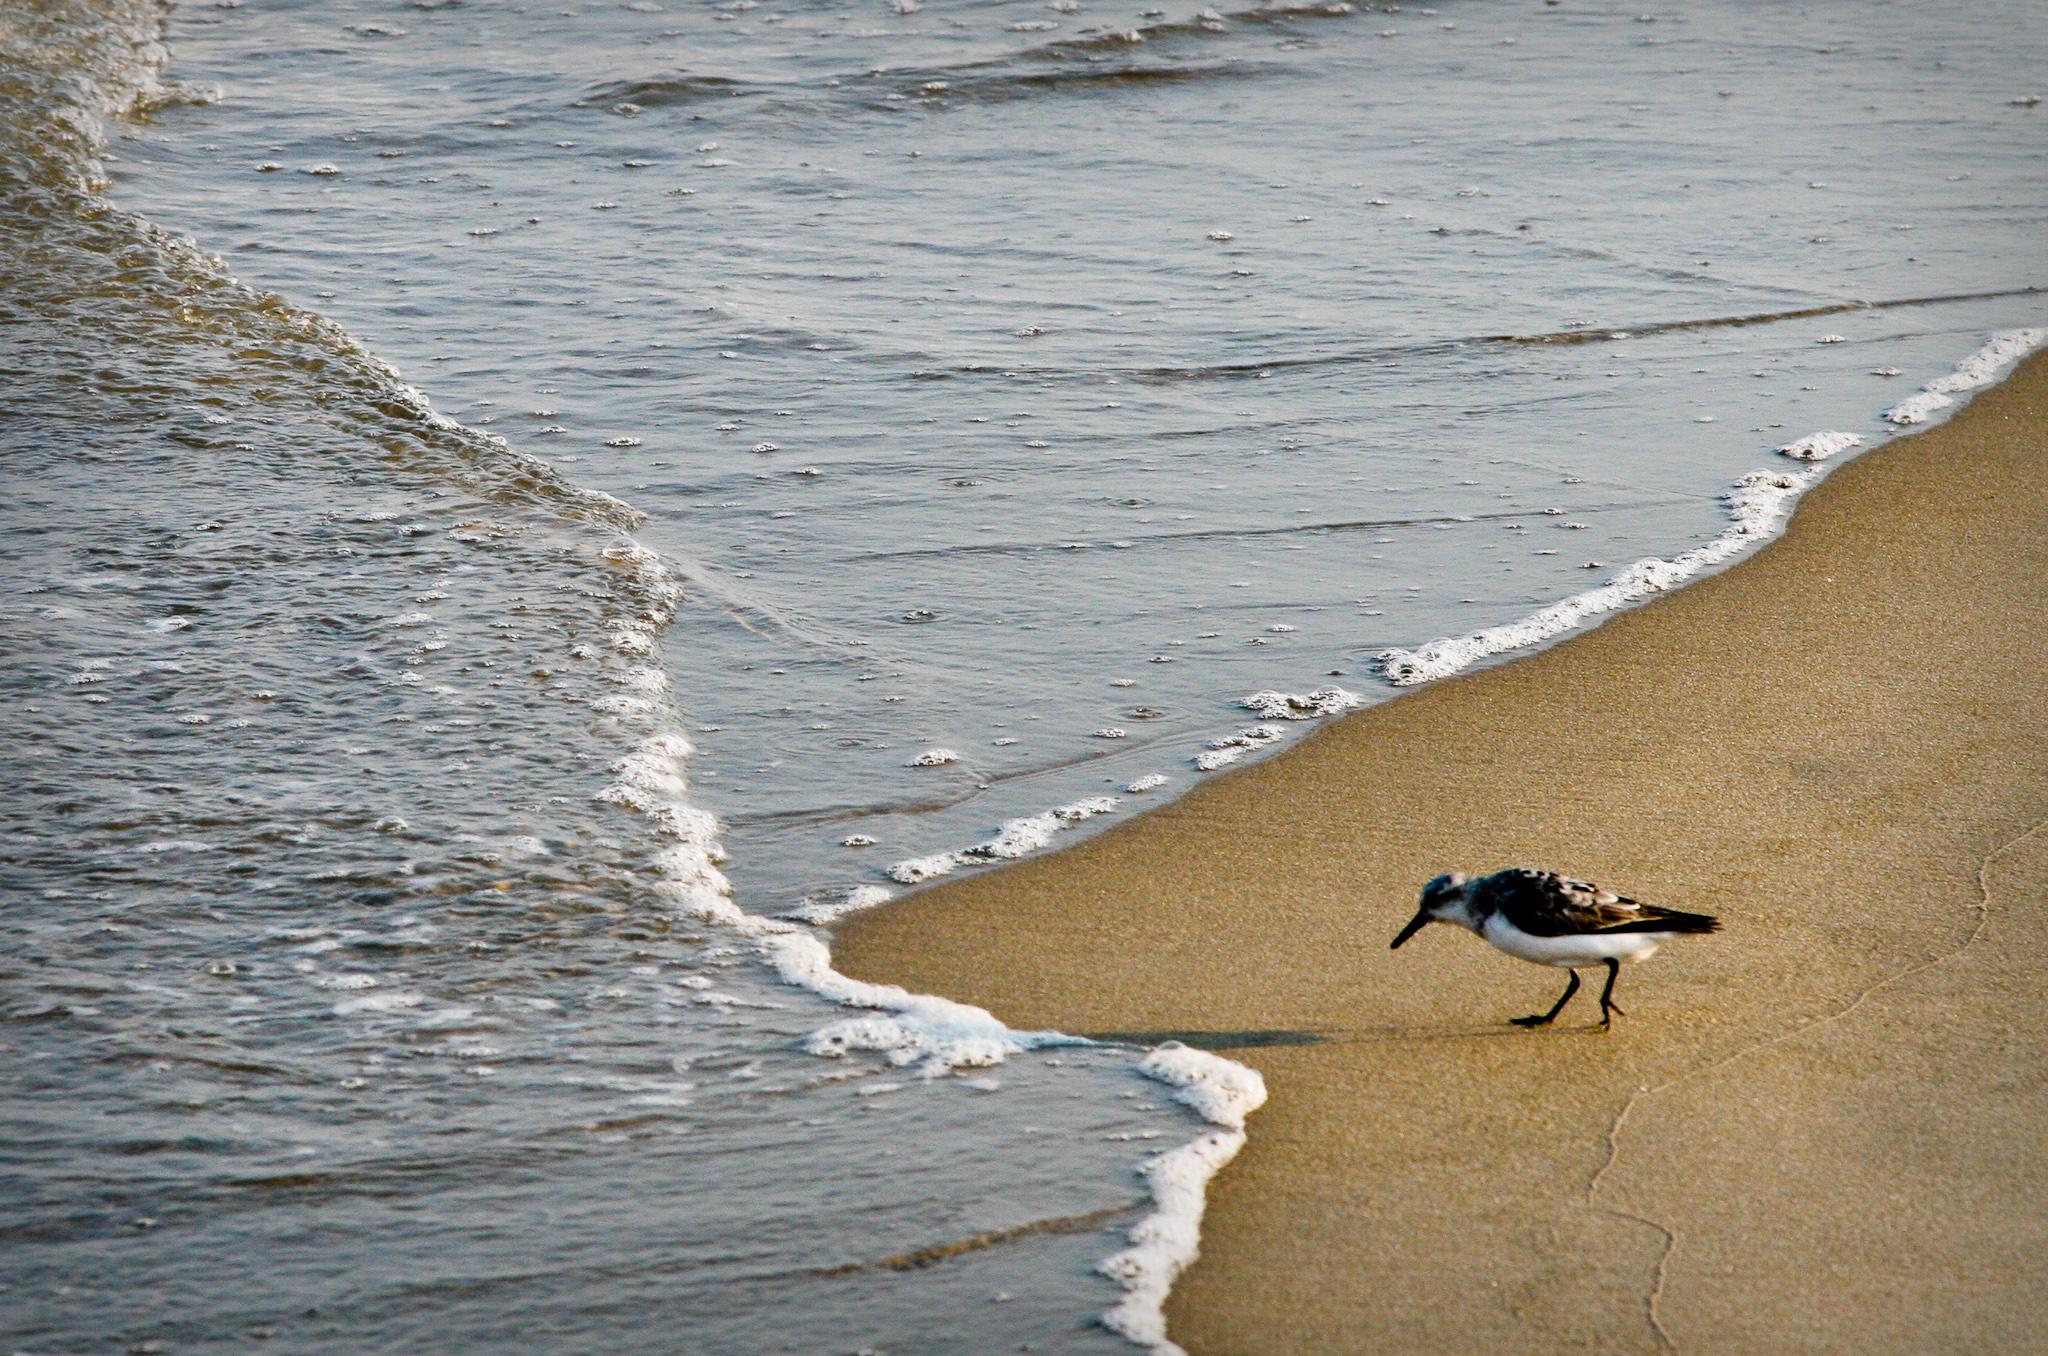 Ocean City, Maryland - September 2007